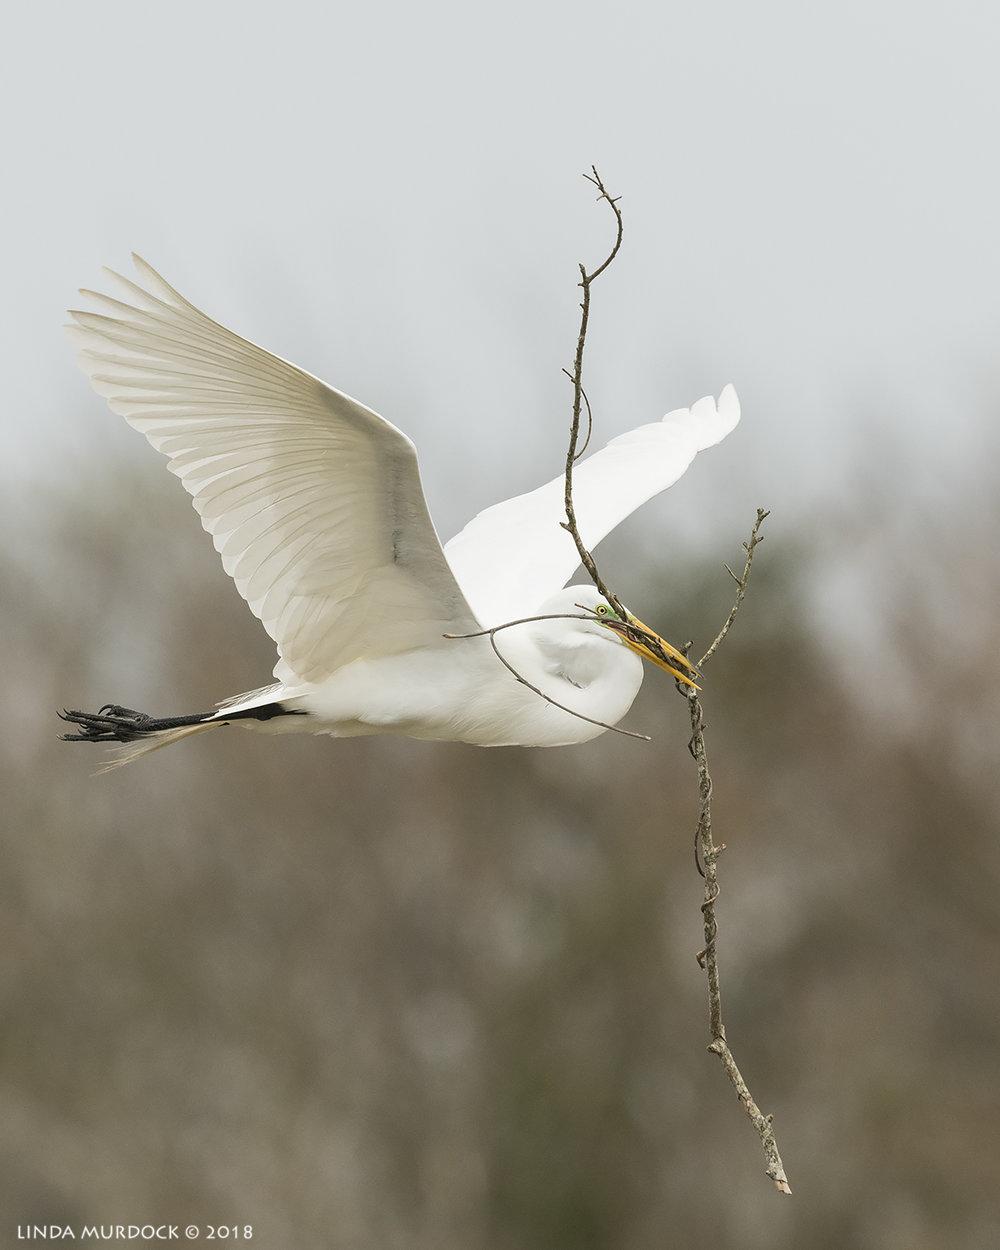 Great Egrets choose interesting sticks for the nests   Nikon D810 with NIKKOR 500mm f/4E VR + Nikon 1.4x TC ~ 1/2500  sec f/7.1 ISO 1000; tripod